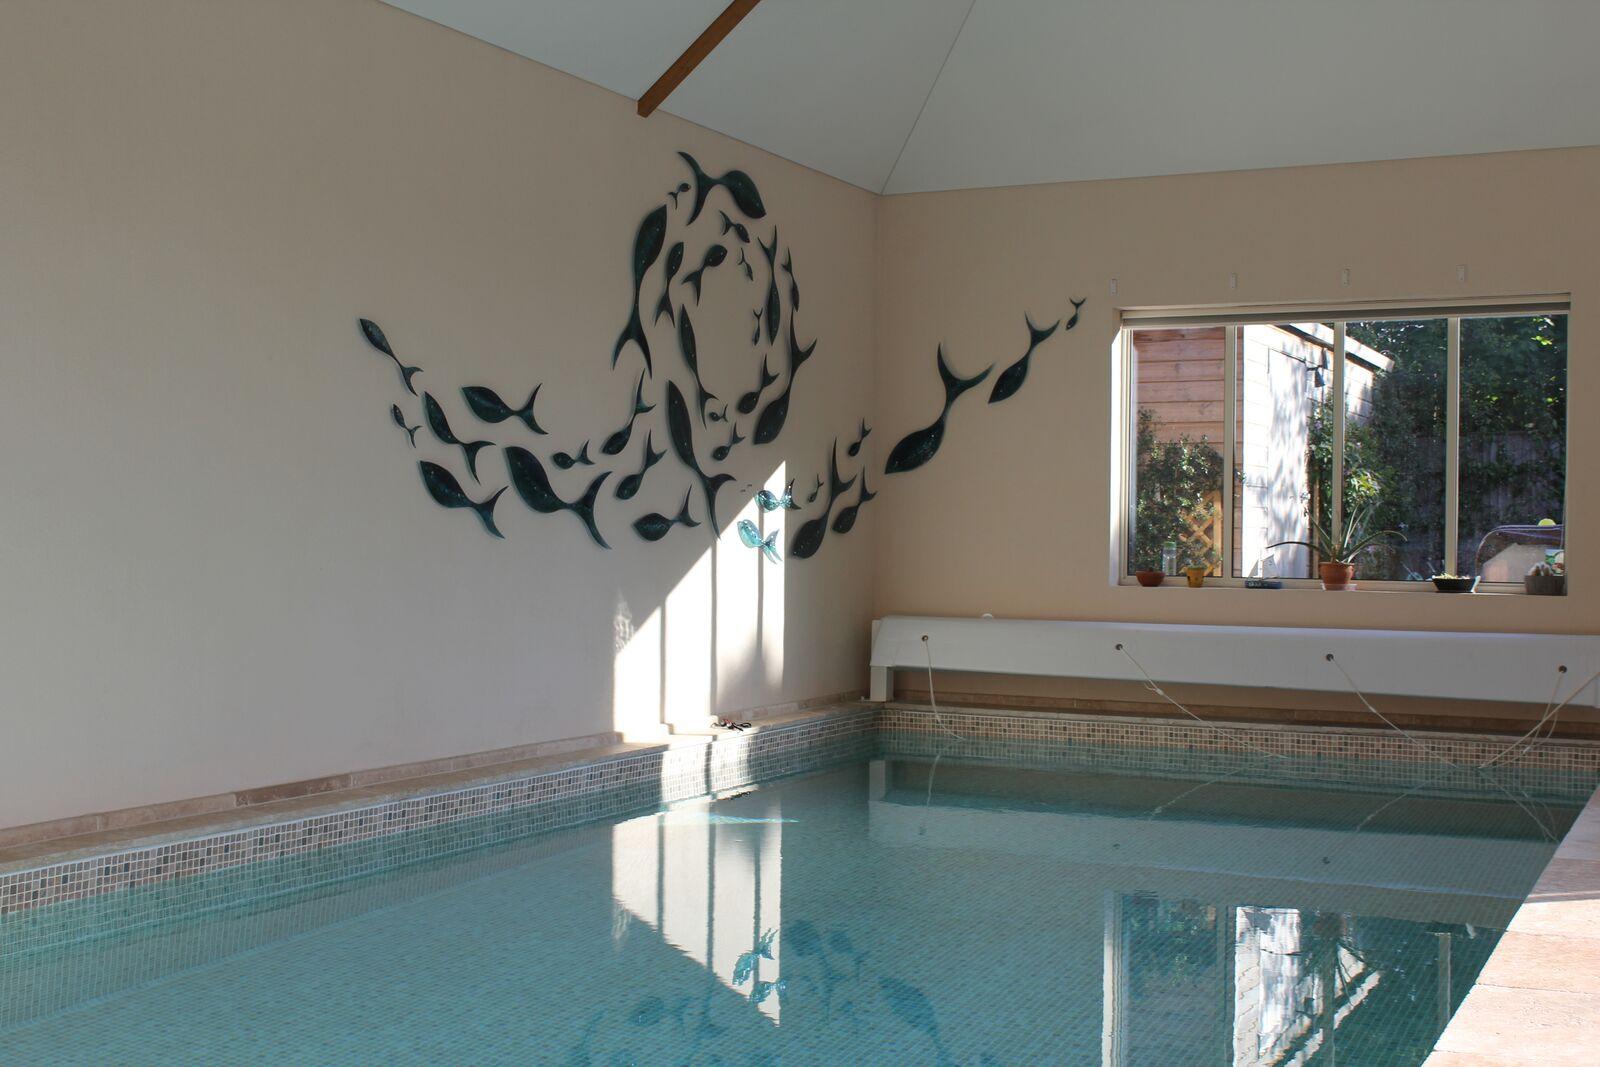 Pool and glass fish